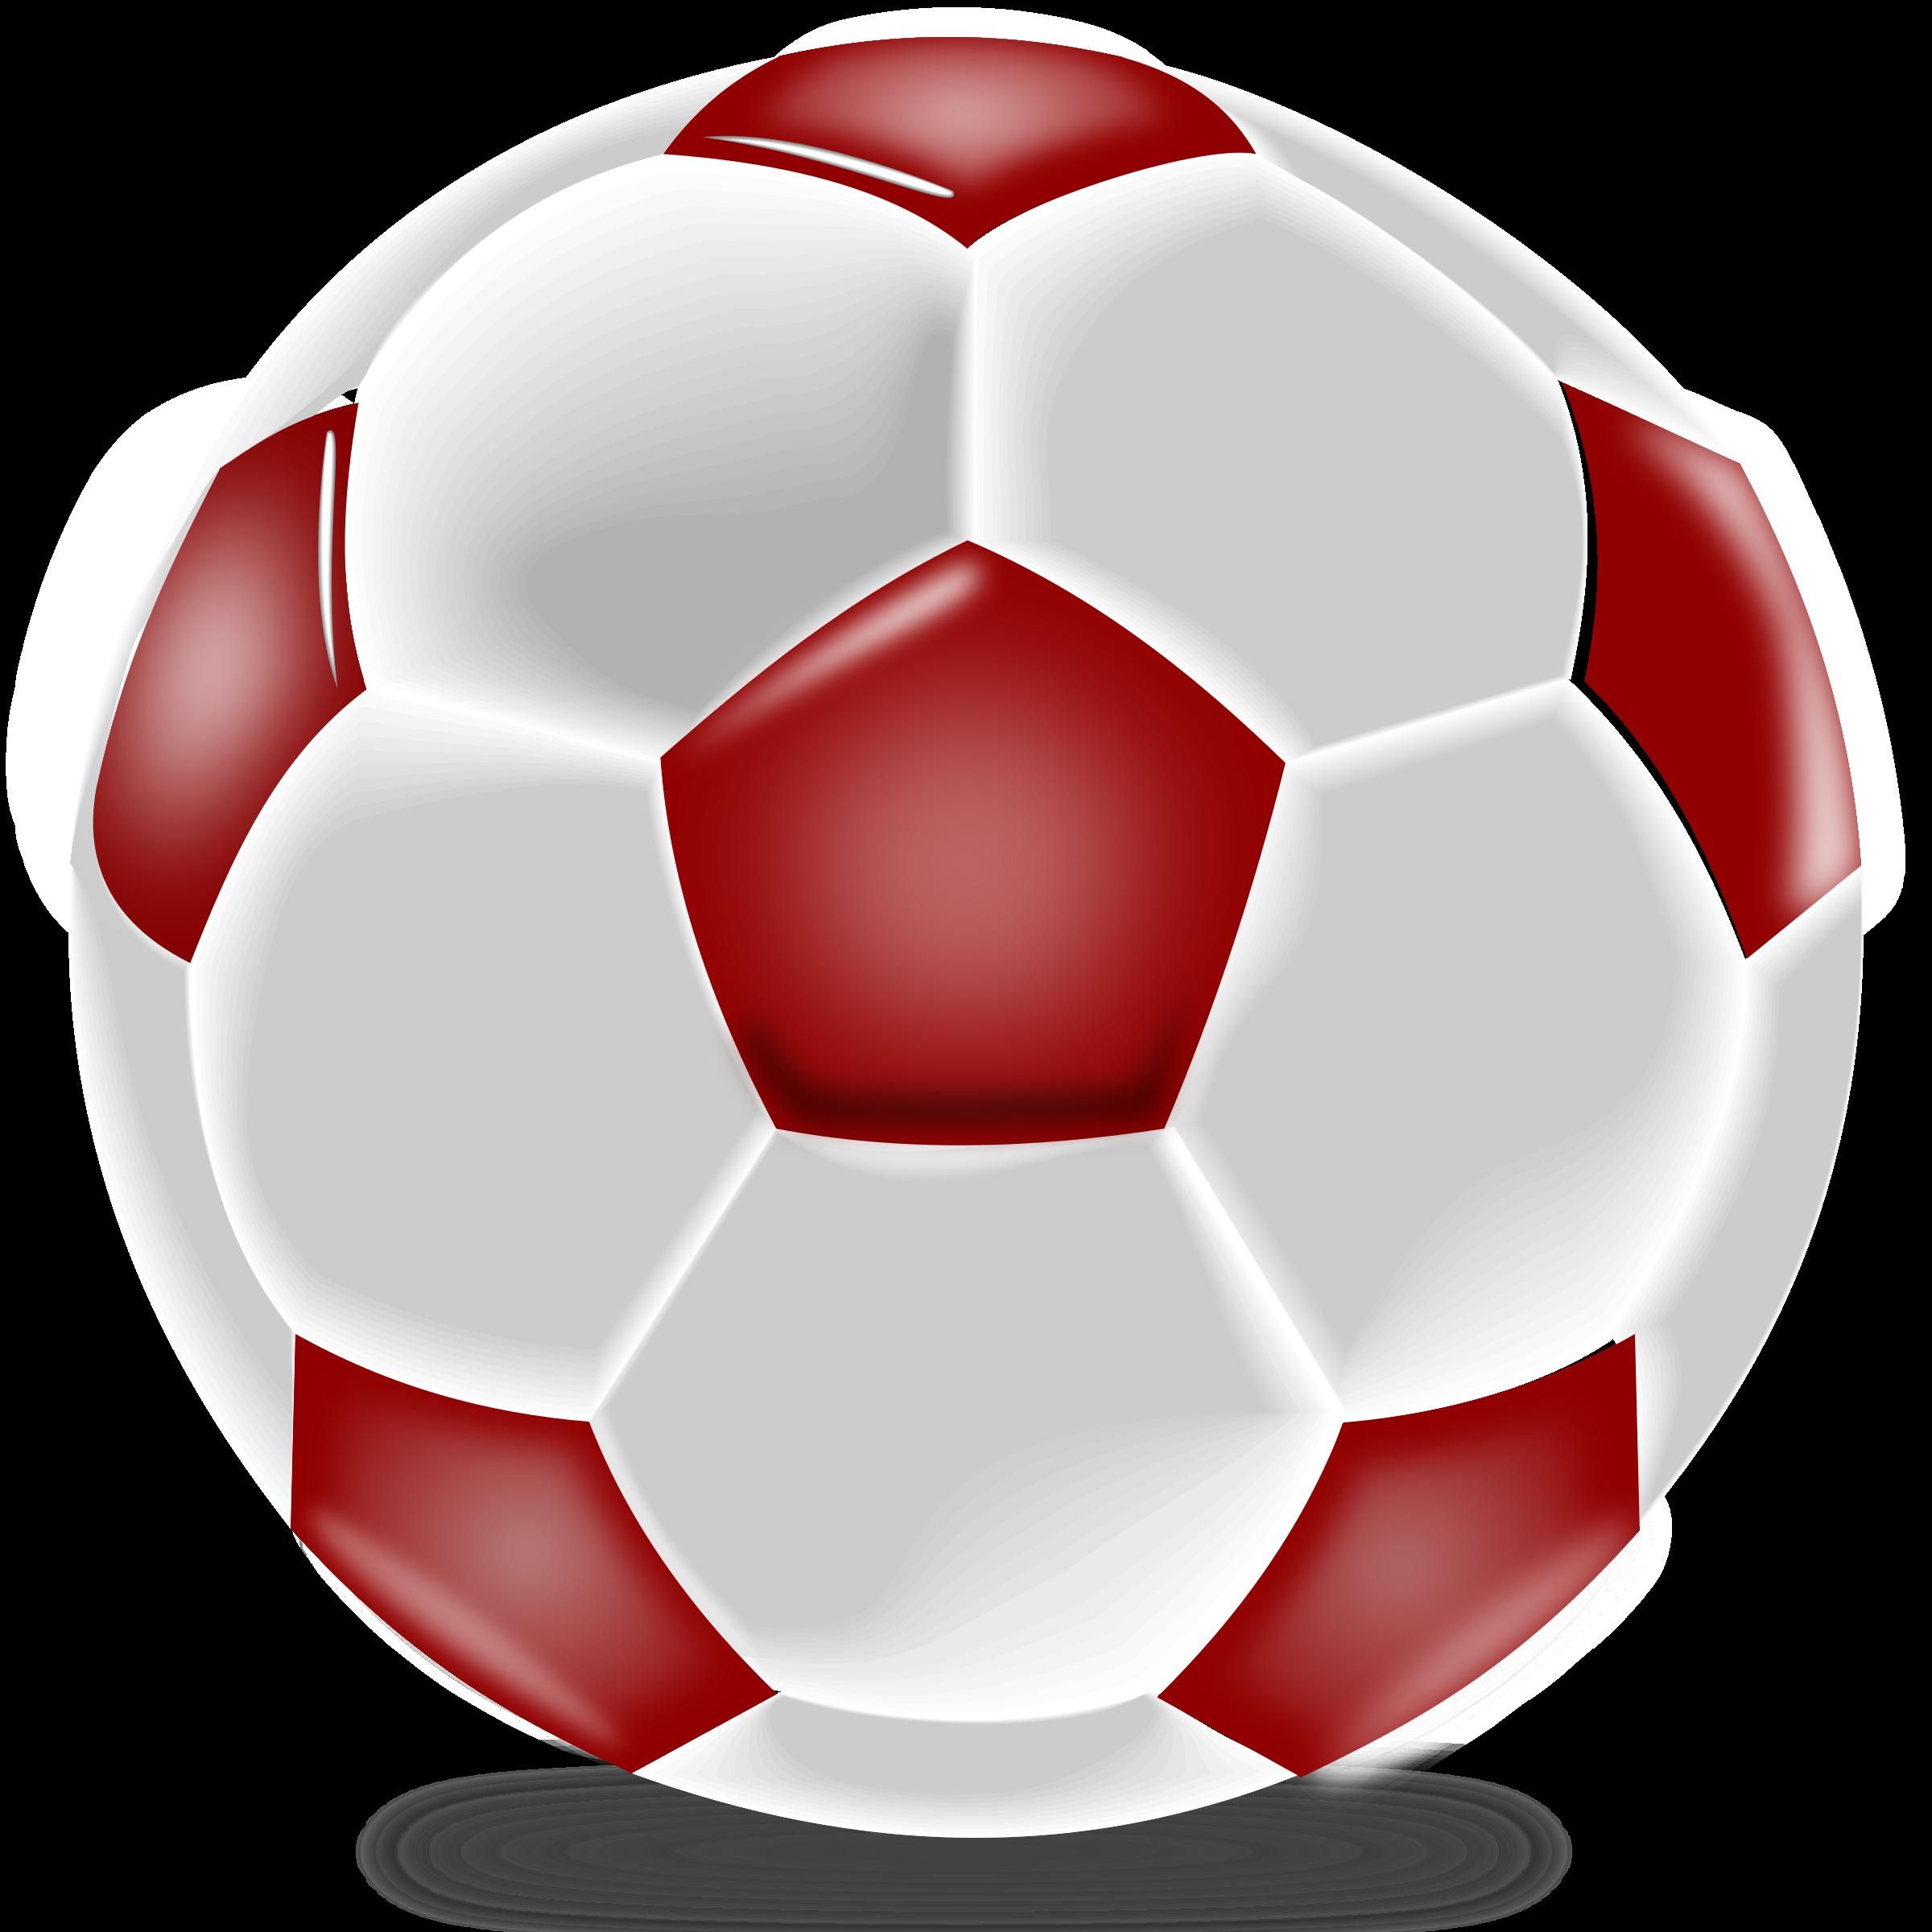 Realistic Soccer Ball By Ilnanny Soccer Ball Ball Soccer